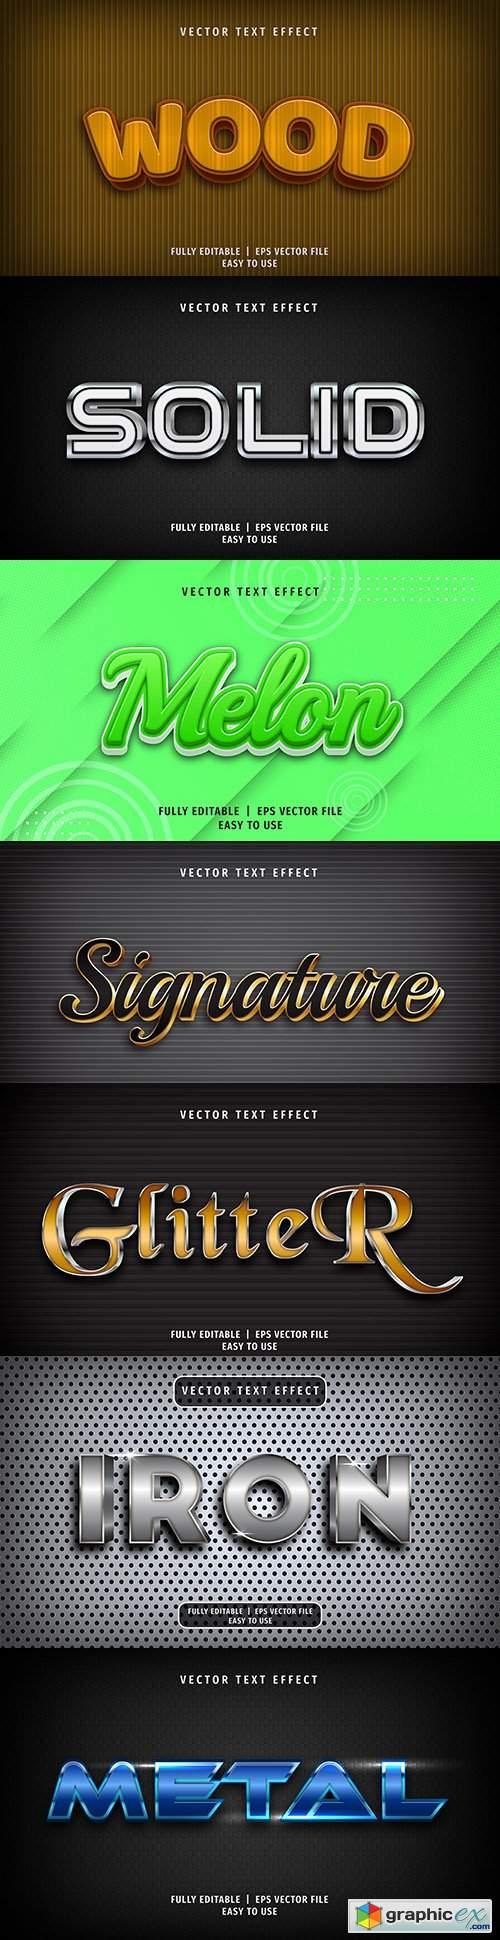 Editable font effect text collection illustration design 183